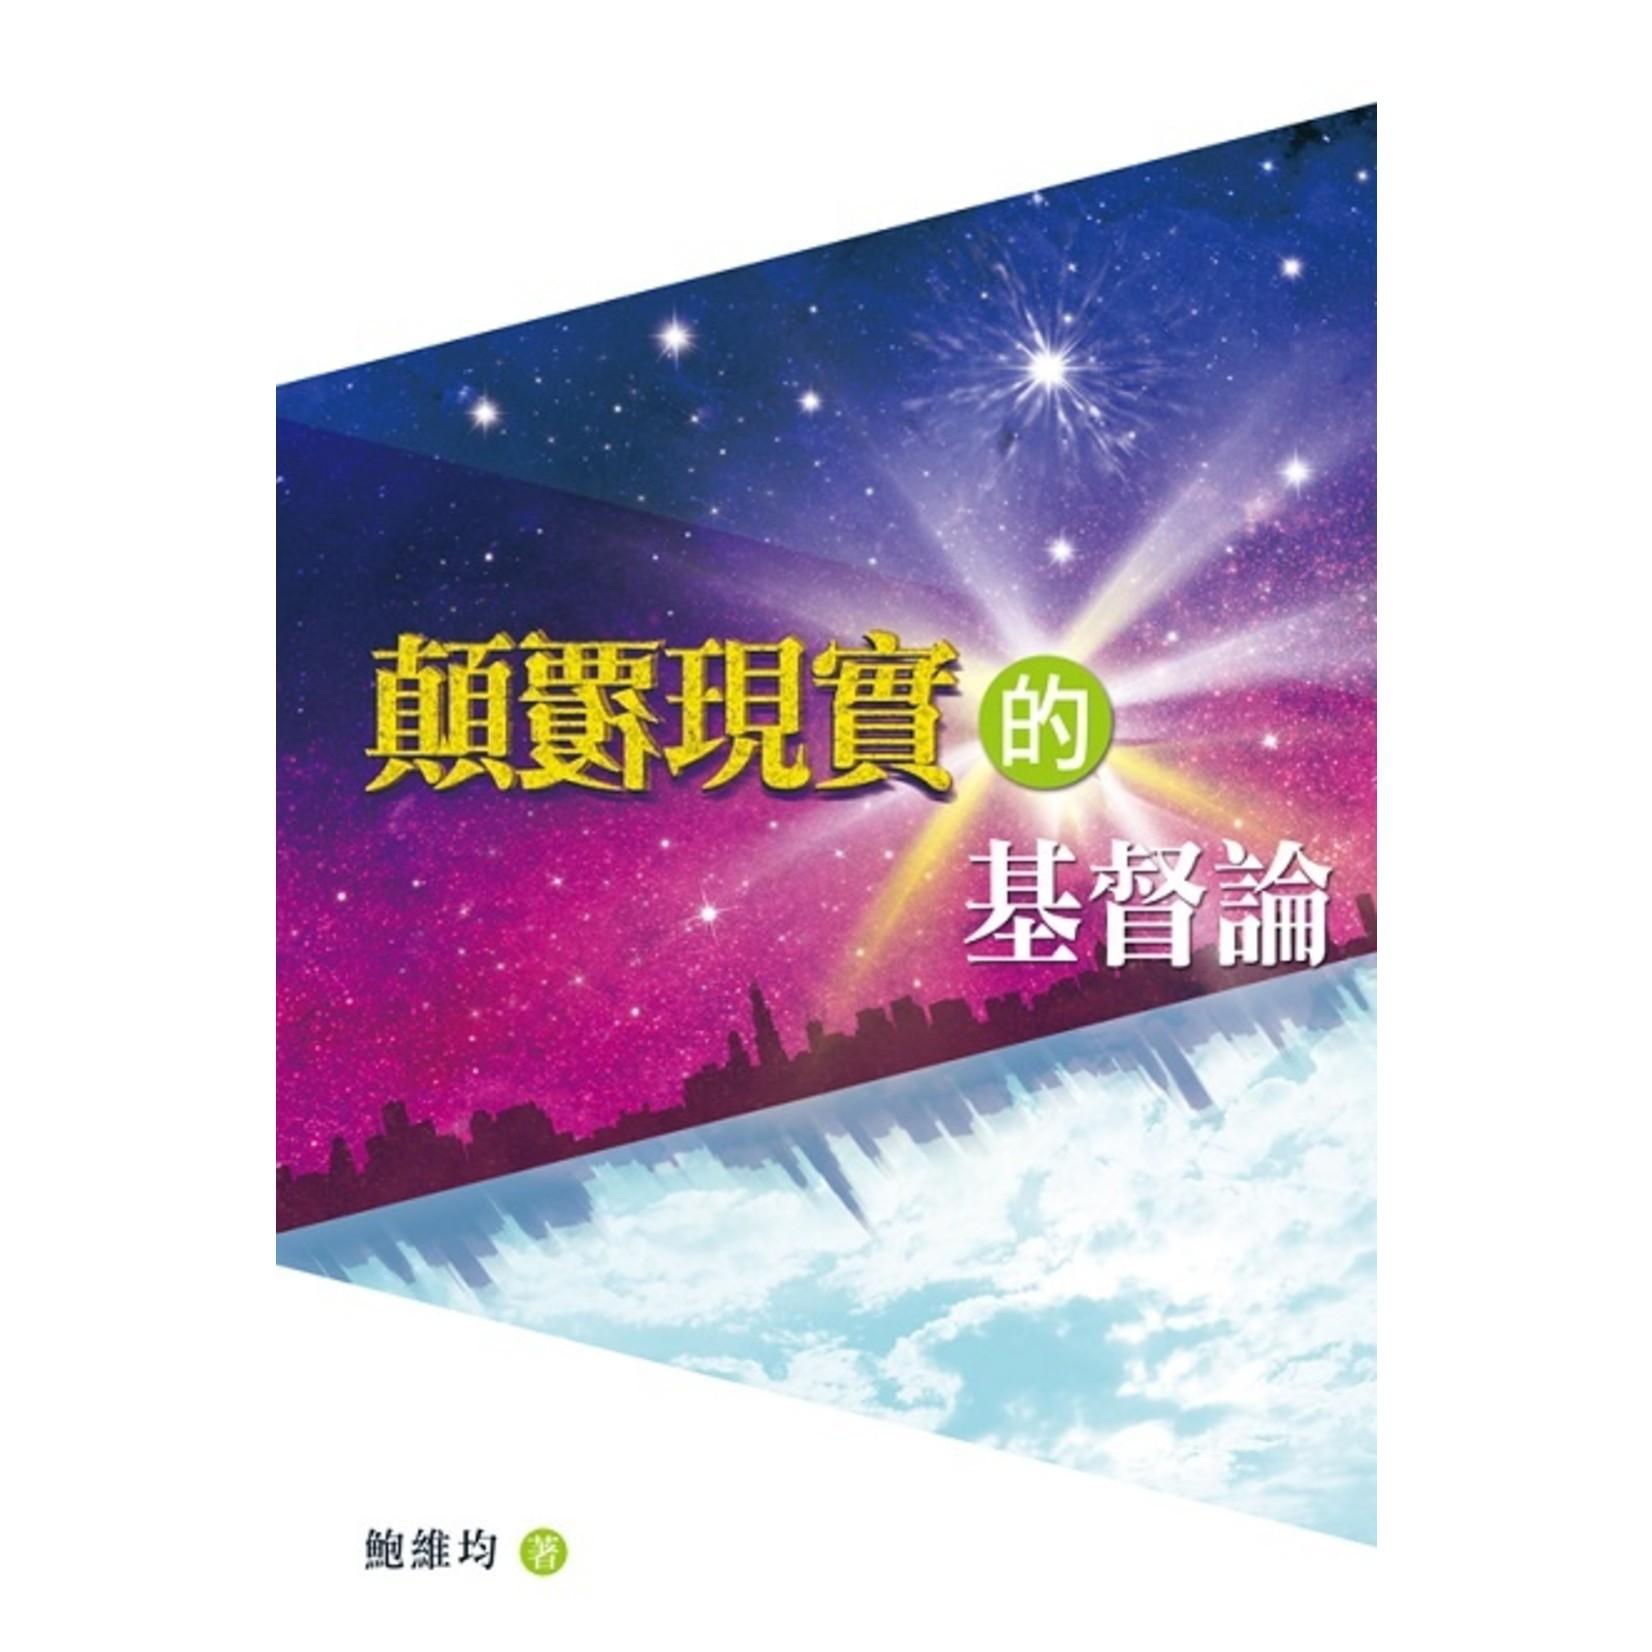 天道書樓 Tien Dao Publishing House 顛覆現實的基督論